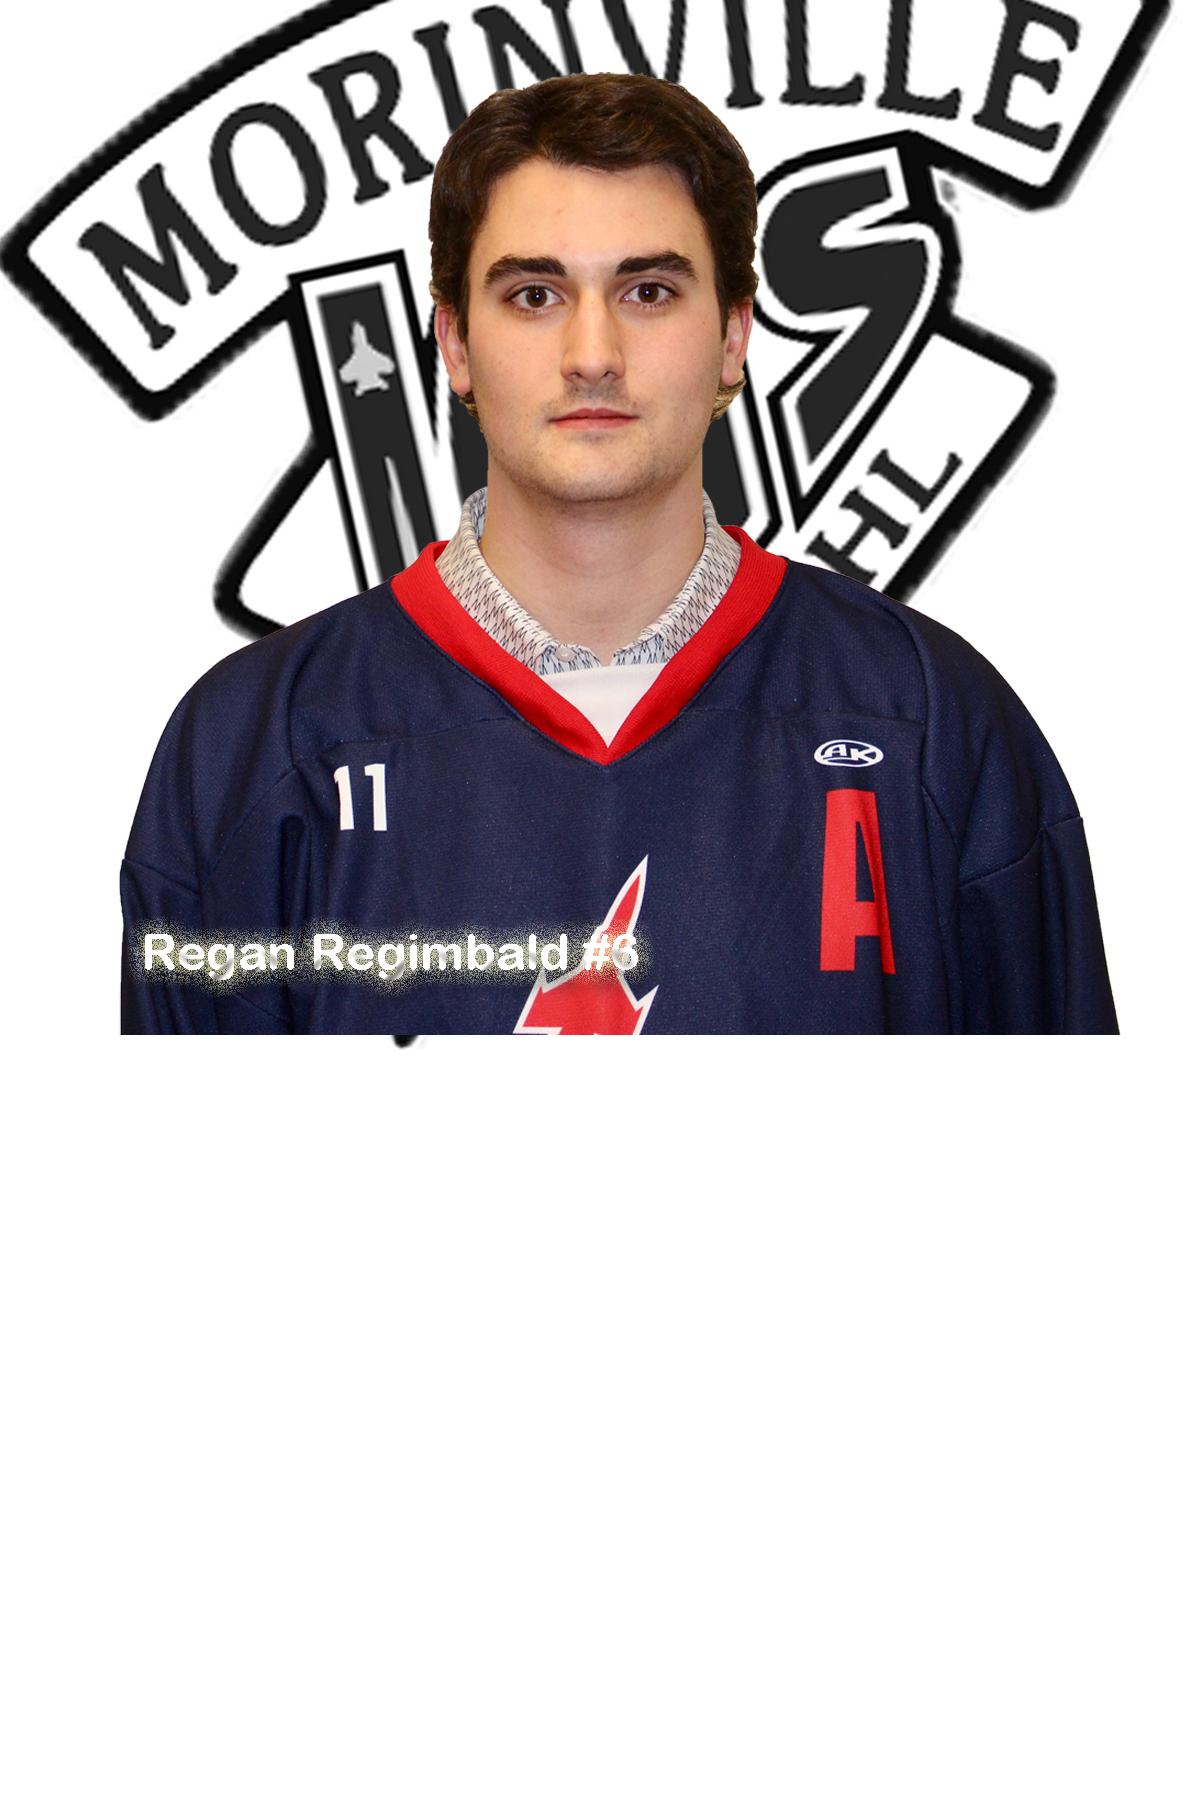 #6 Regan Regimbald